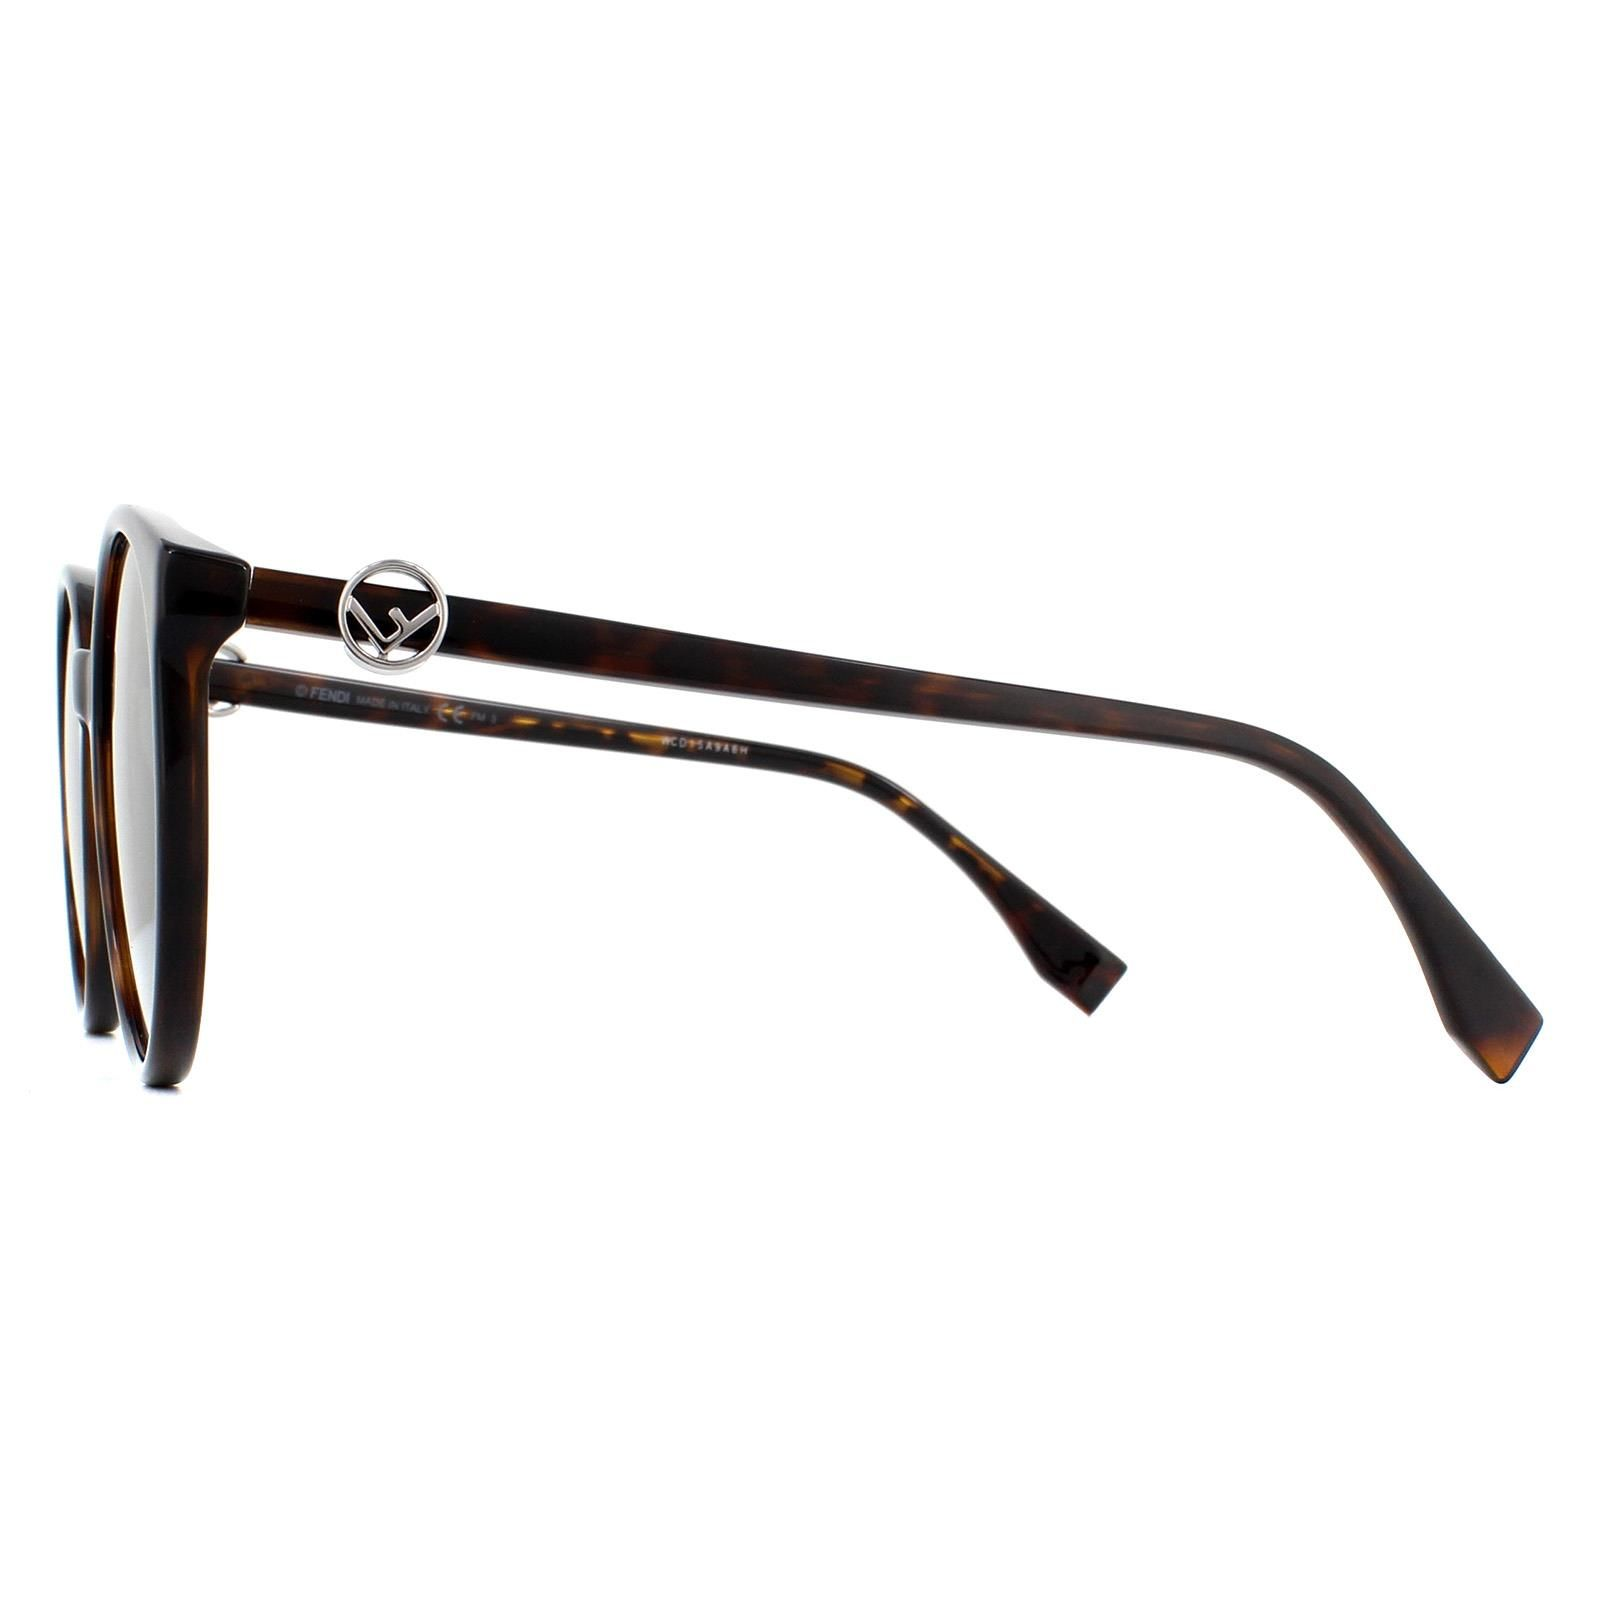 Fendi Sunglasses FF 0288/S 086 9O Dark Havana Grey Gradient